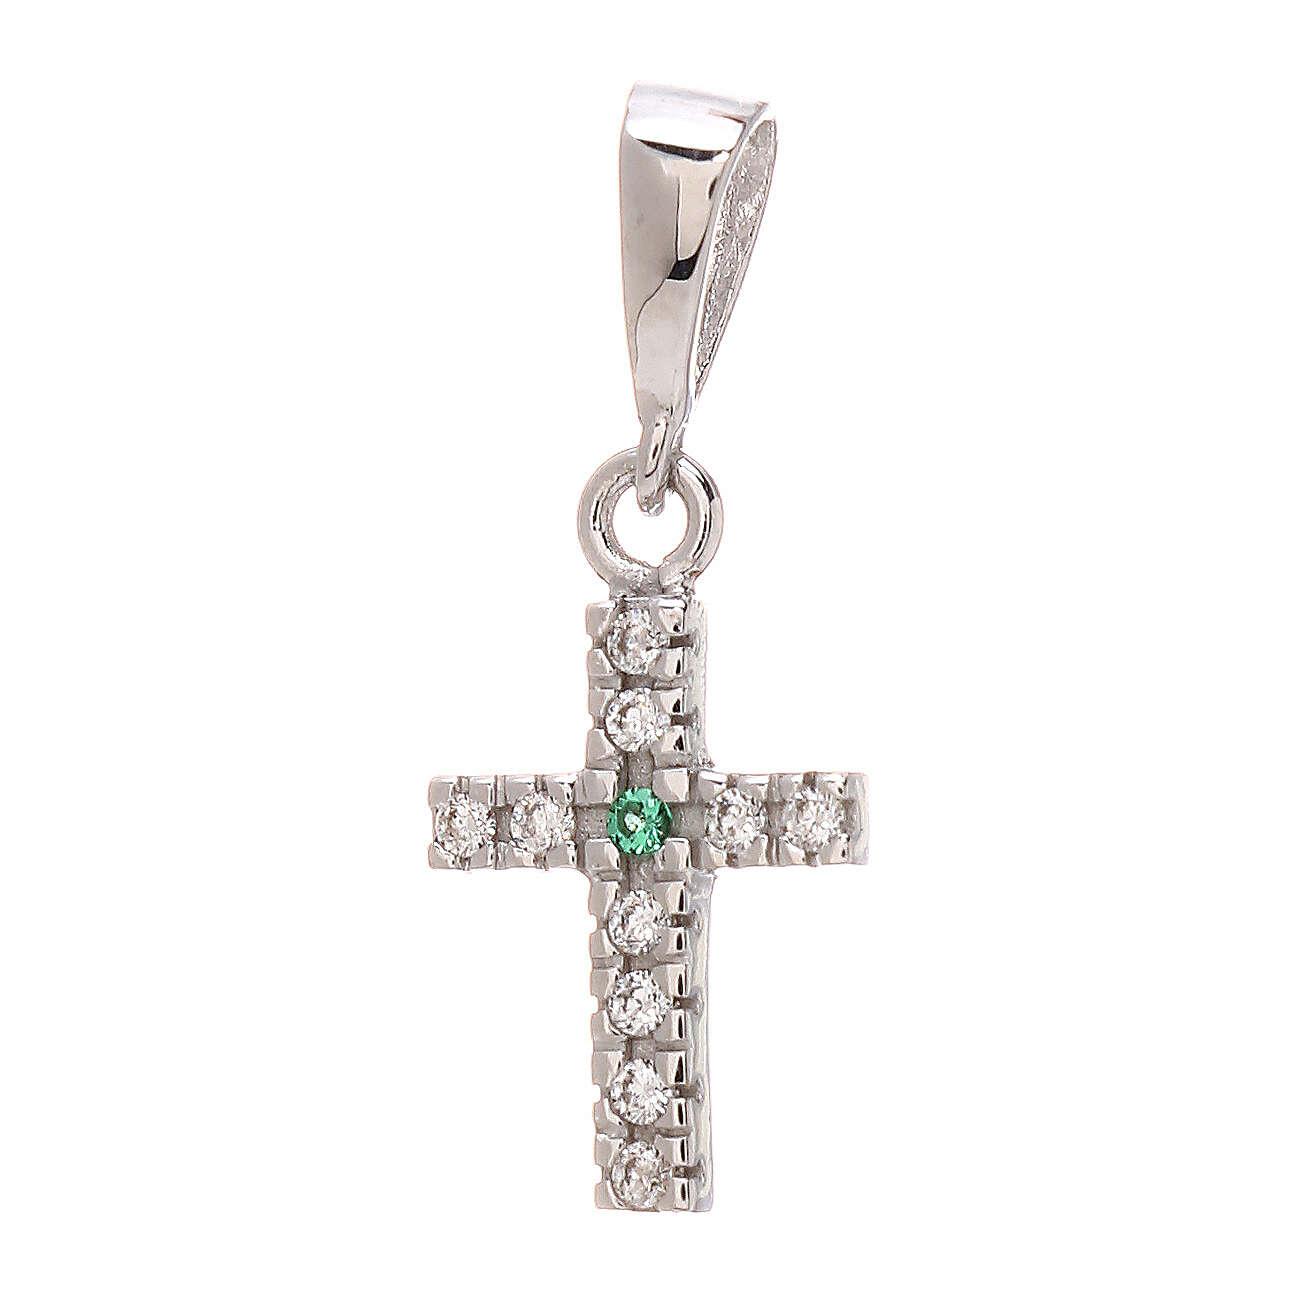 Croix pendentif Swarovski blancs vert or blanc 750/00 0,85 gr 4